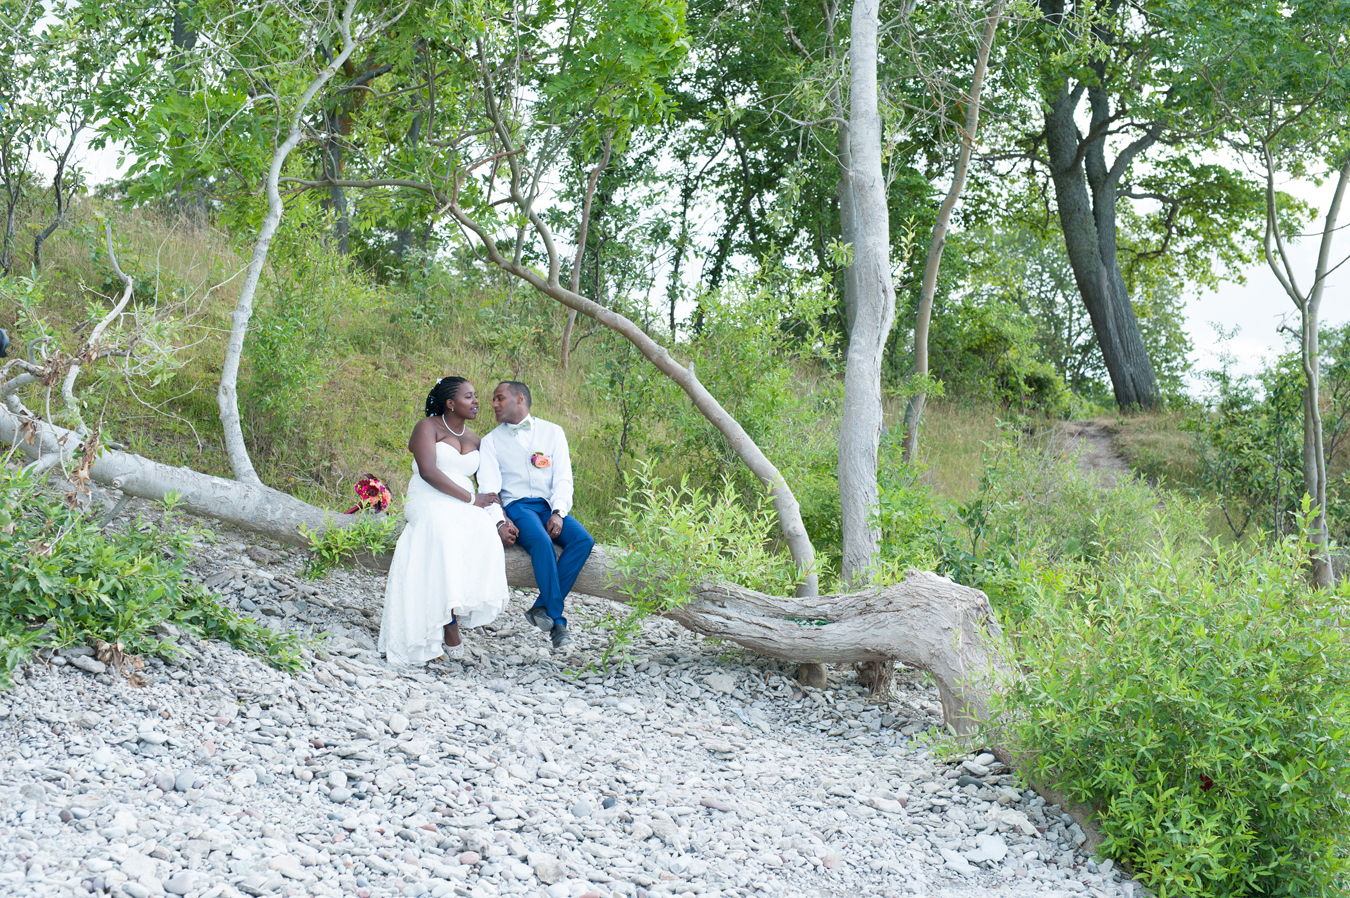 039-bröllop-gotland-fridhem-neas-fotografi.jpg